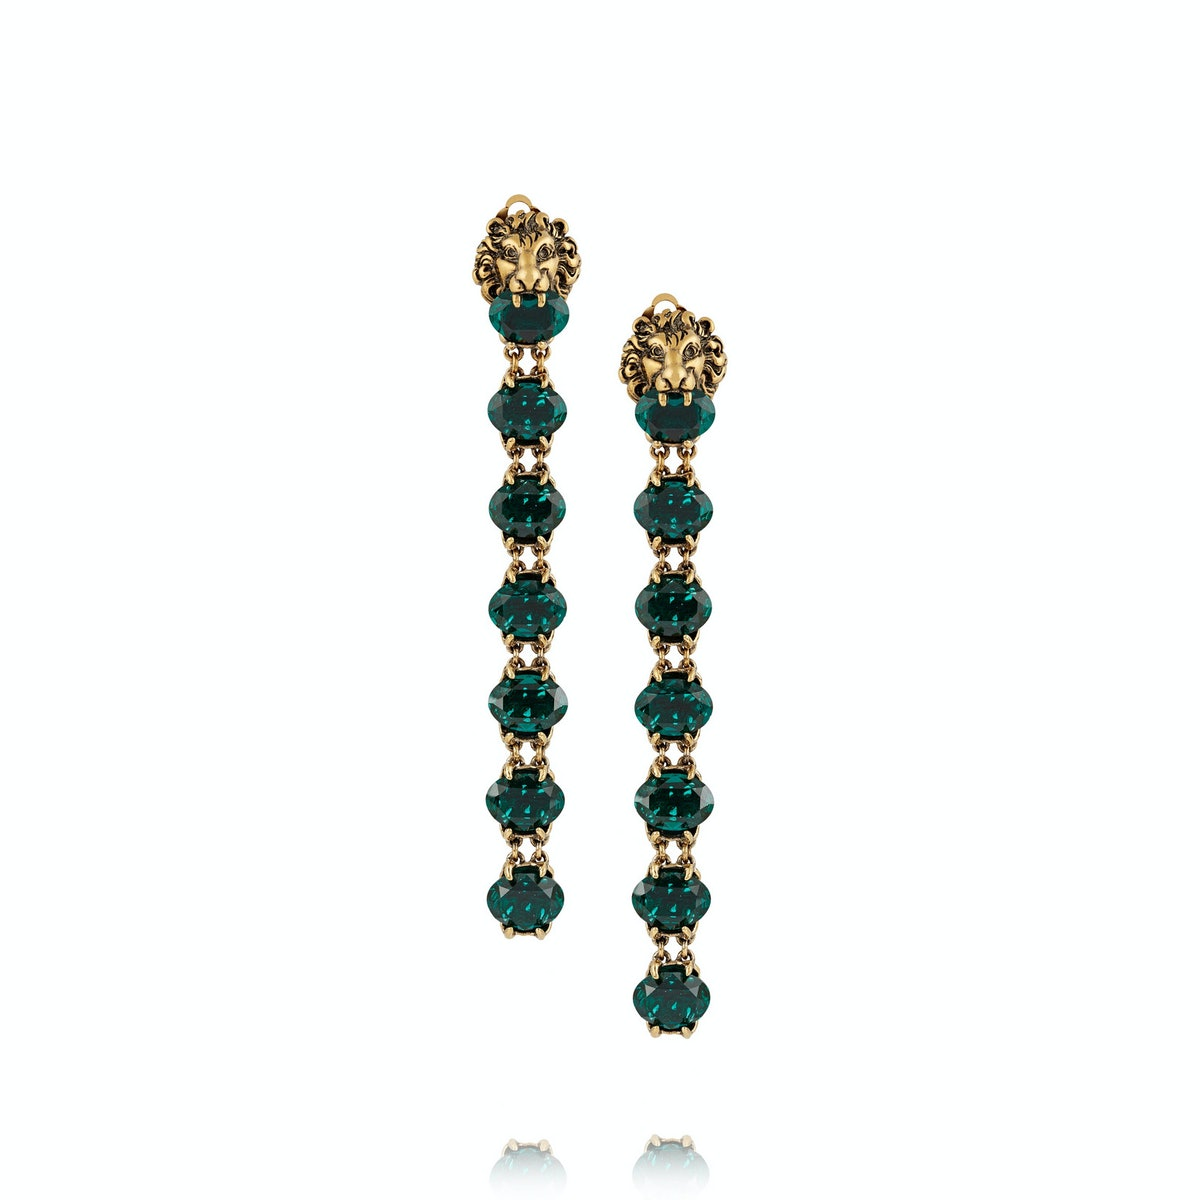 Gucci earrings, $1,450, netaporter.com.